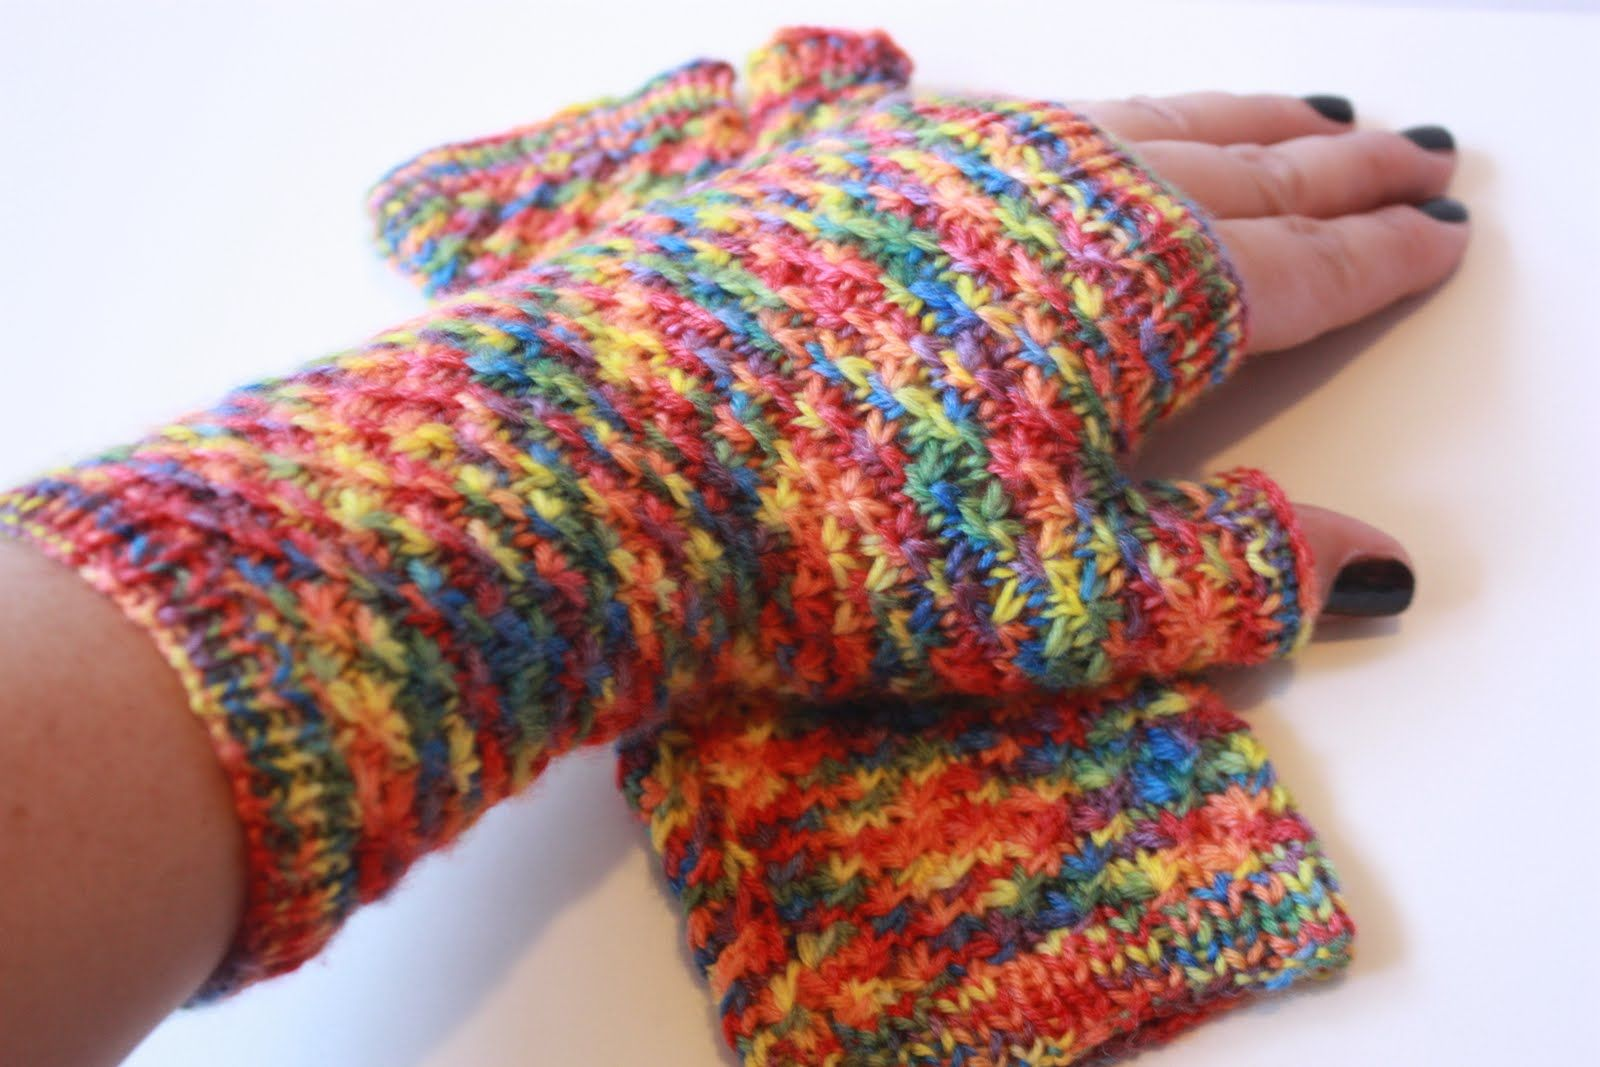 variegated knitting yarns - Google Search | Fingerless ...